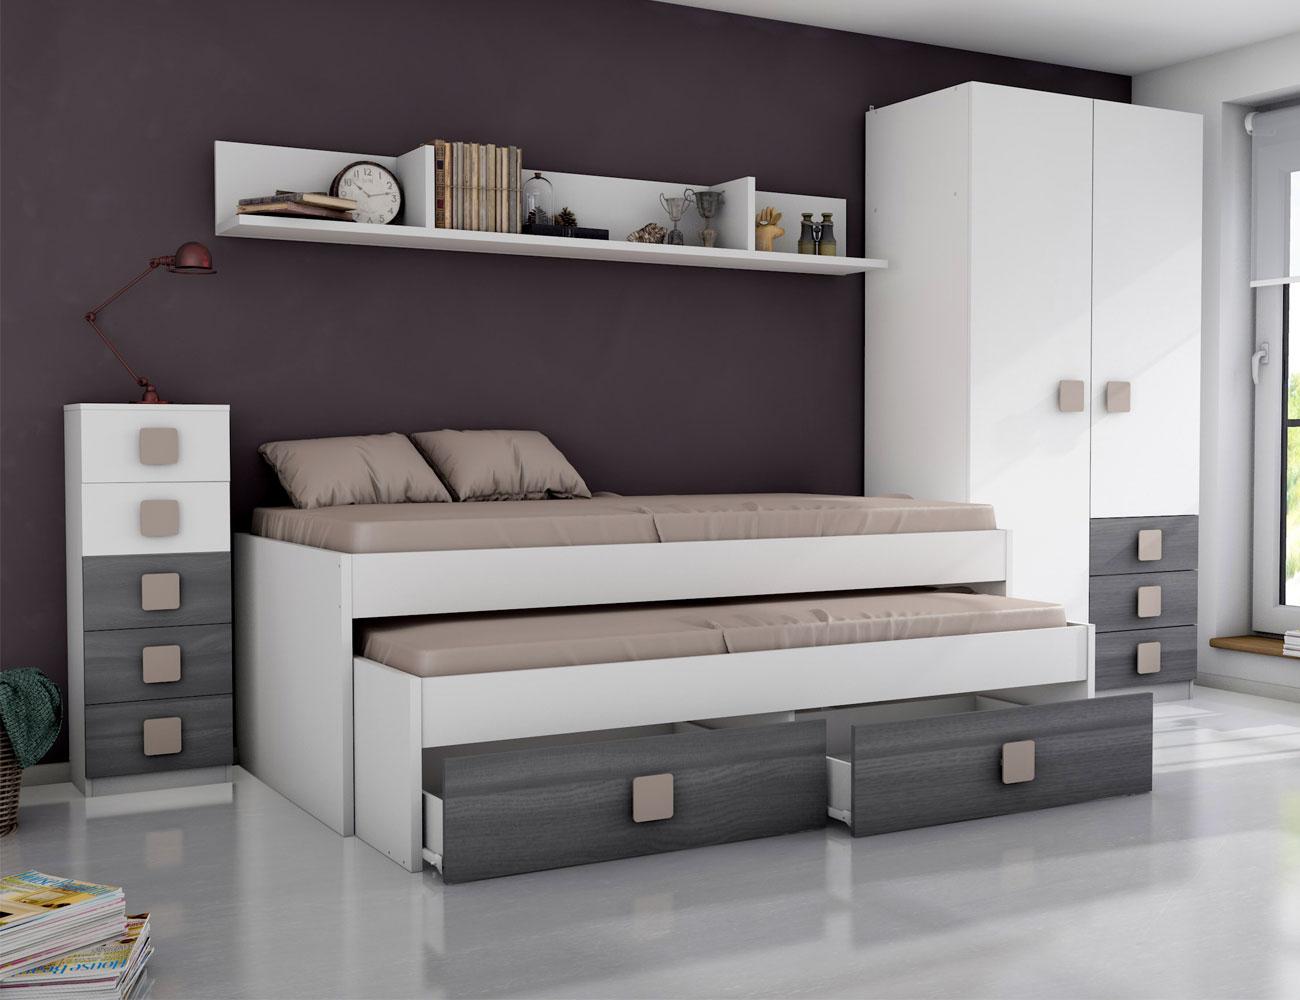 Dormitorio juvenil ceniza moka1